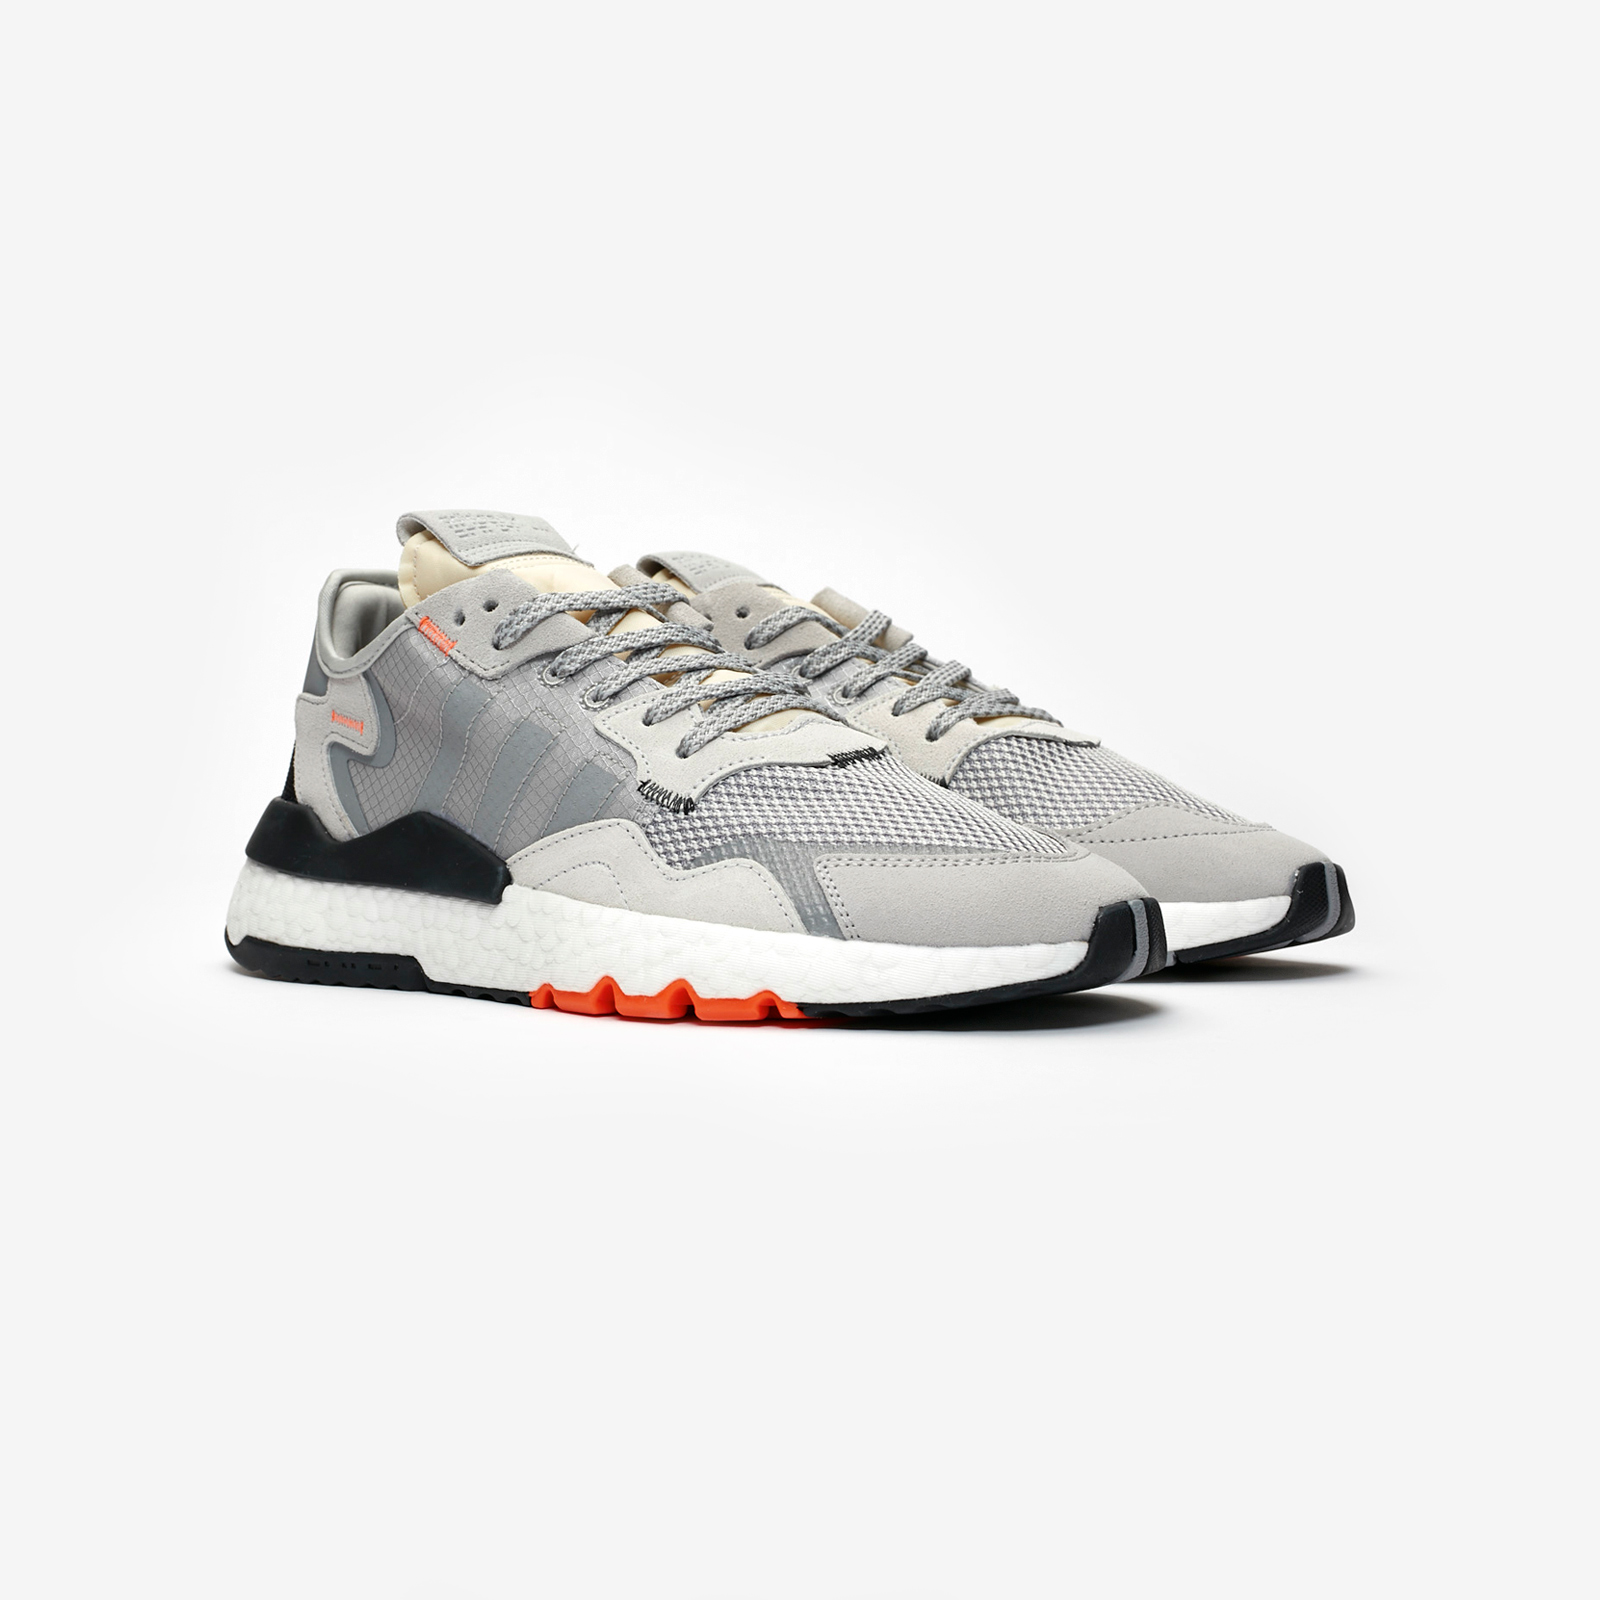 cb5132a05ef adidas Nite Jogger - Db3361 - Sneakersnstuff   sneakers & streetwear ...